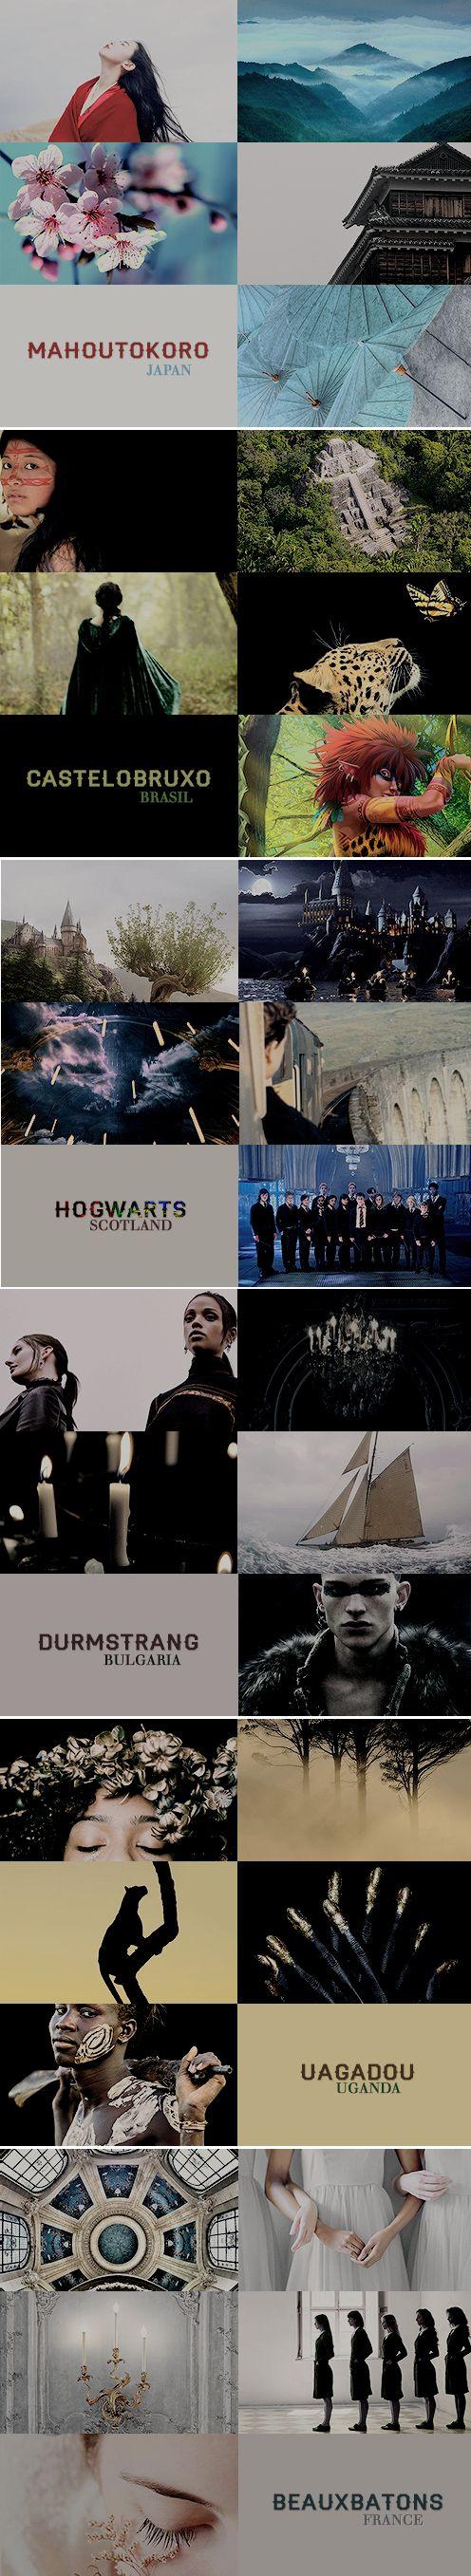 Wizarding Schools Around the World: Beauxbatons / Castelobruxo / Durmstrang / Hogwarts / Mahoutokoro / Uagadou #hp